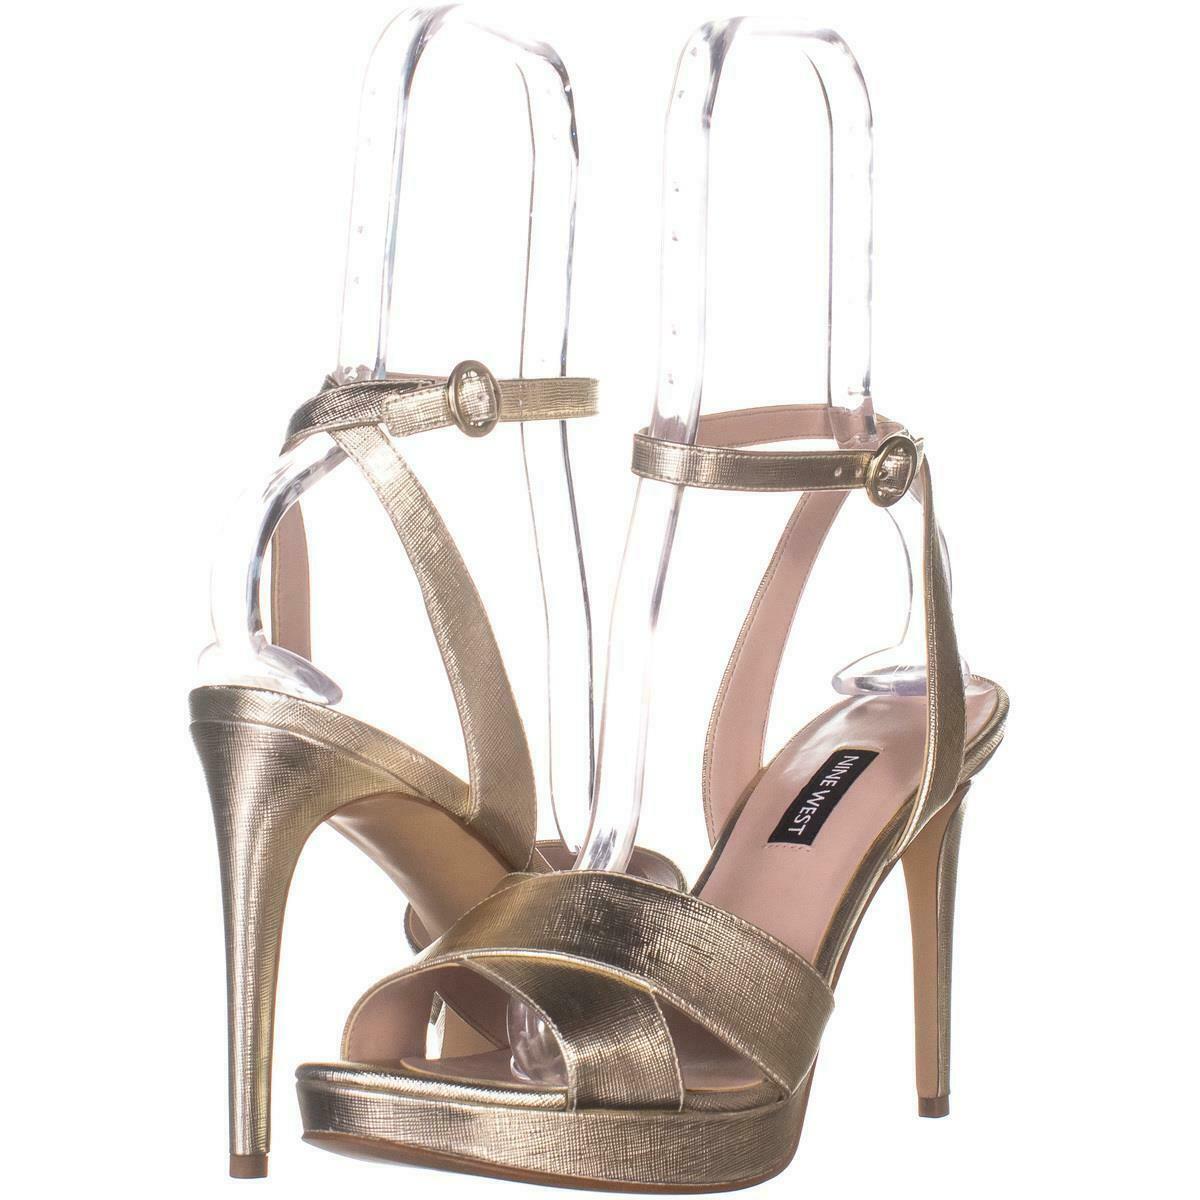 Nine West Quisha Criss Cross Ankle Strap Sandals 021, Light Gold, 8.5 US - $32.25